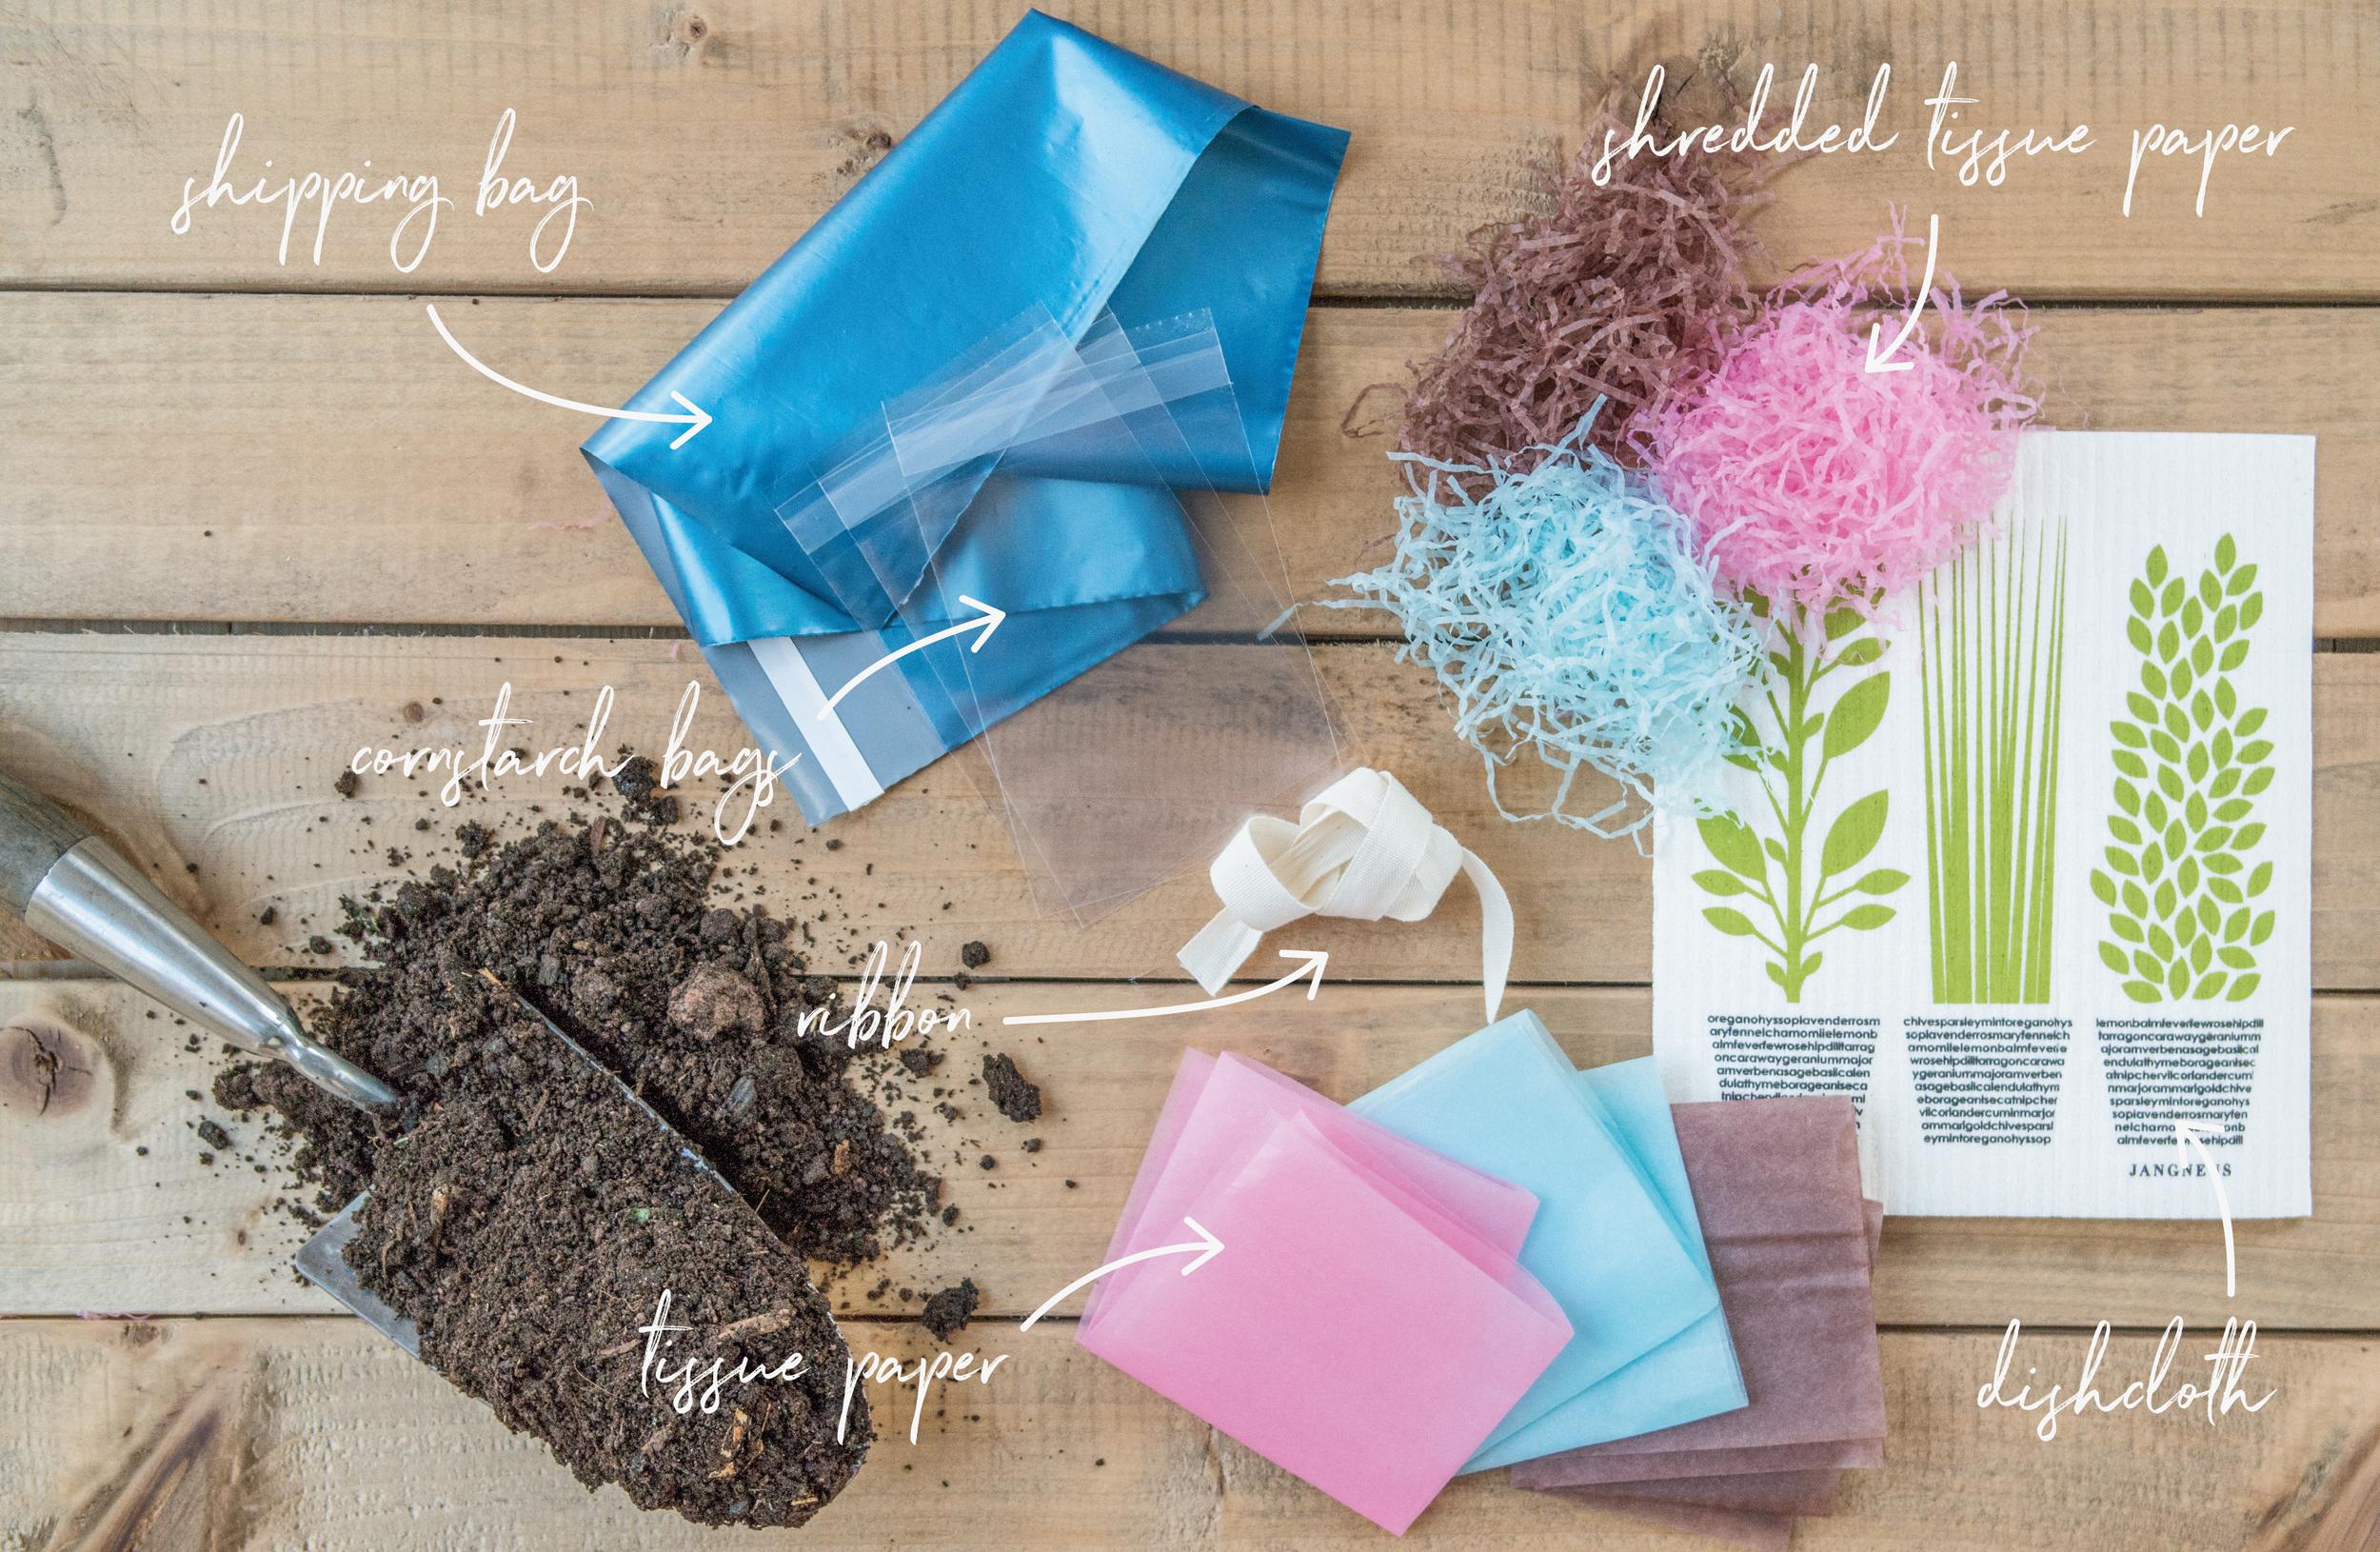 Bakery Cakery | FAQ | biodegradable packaging